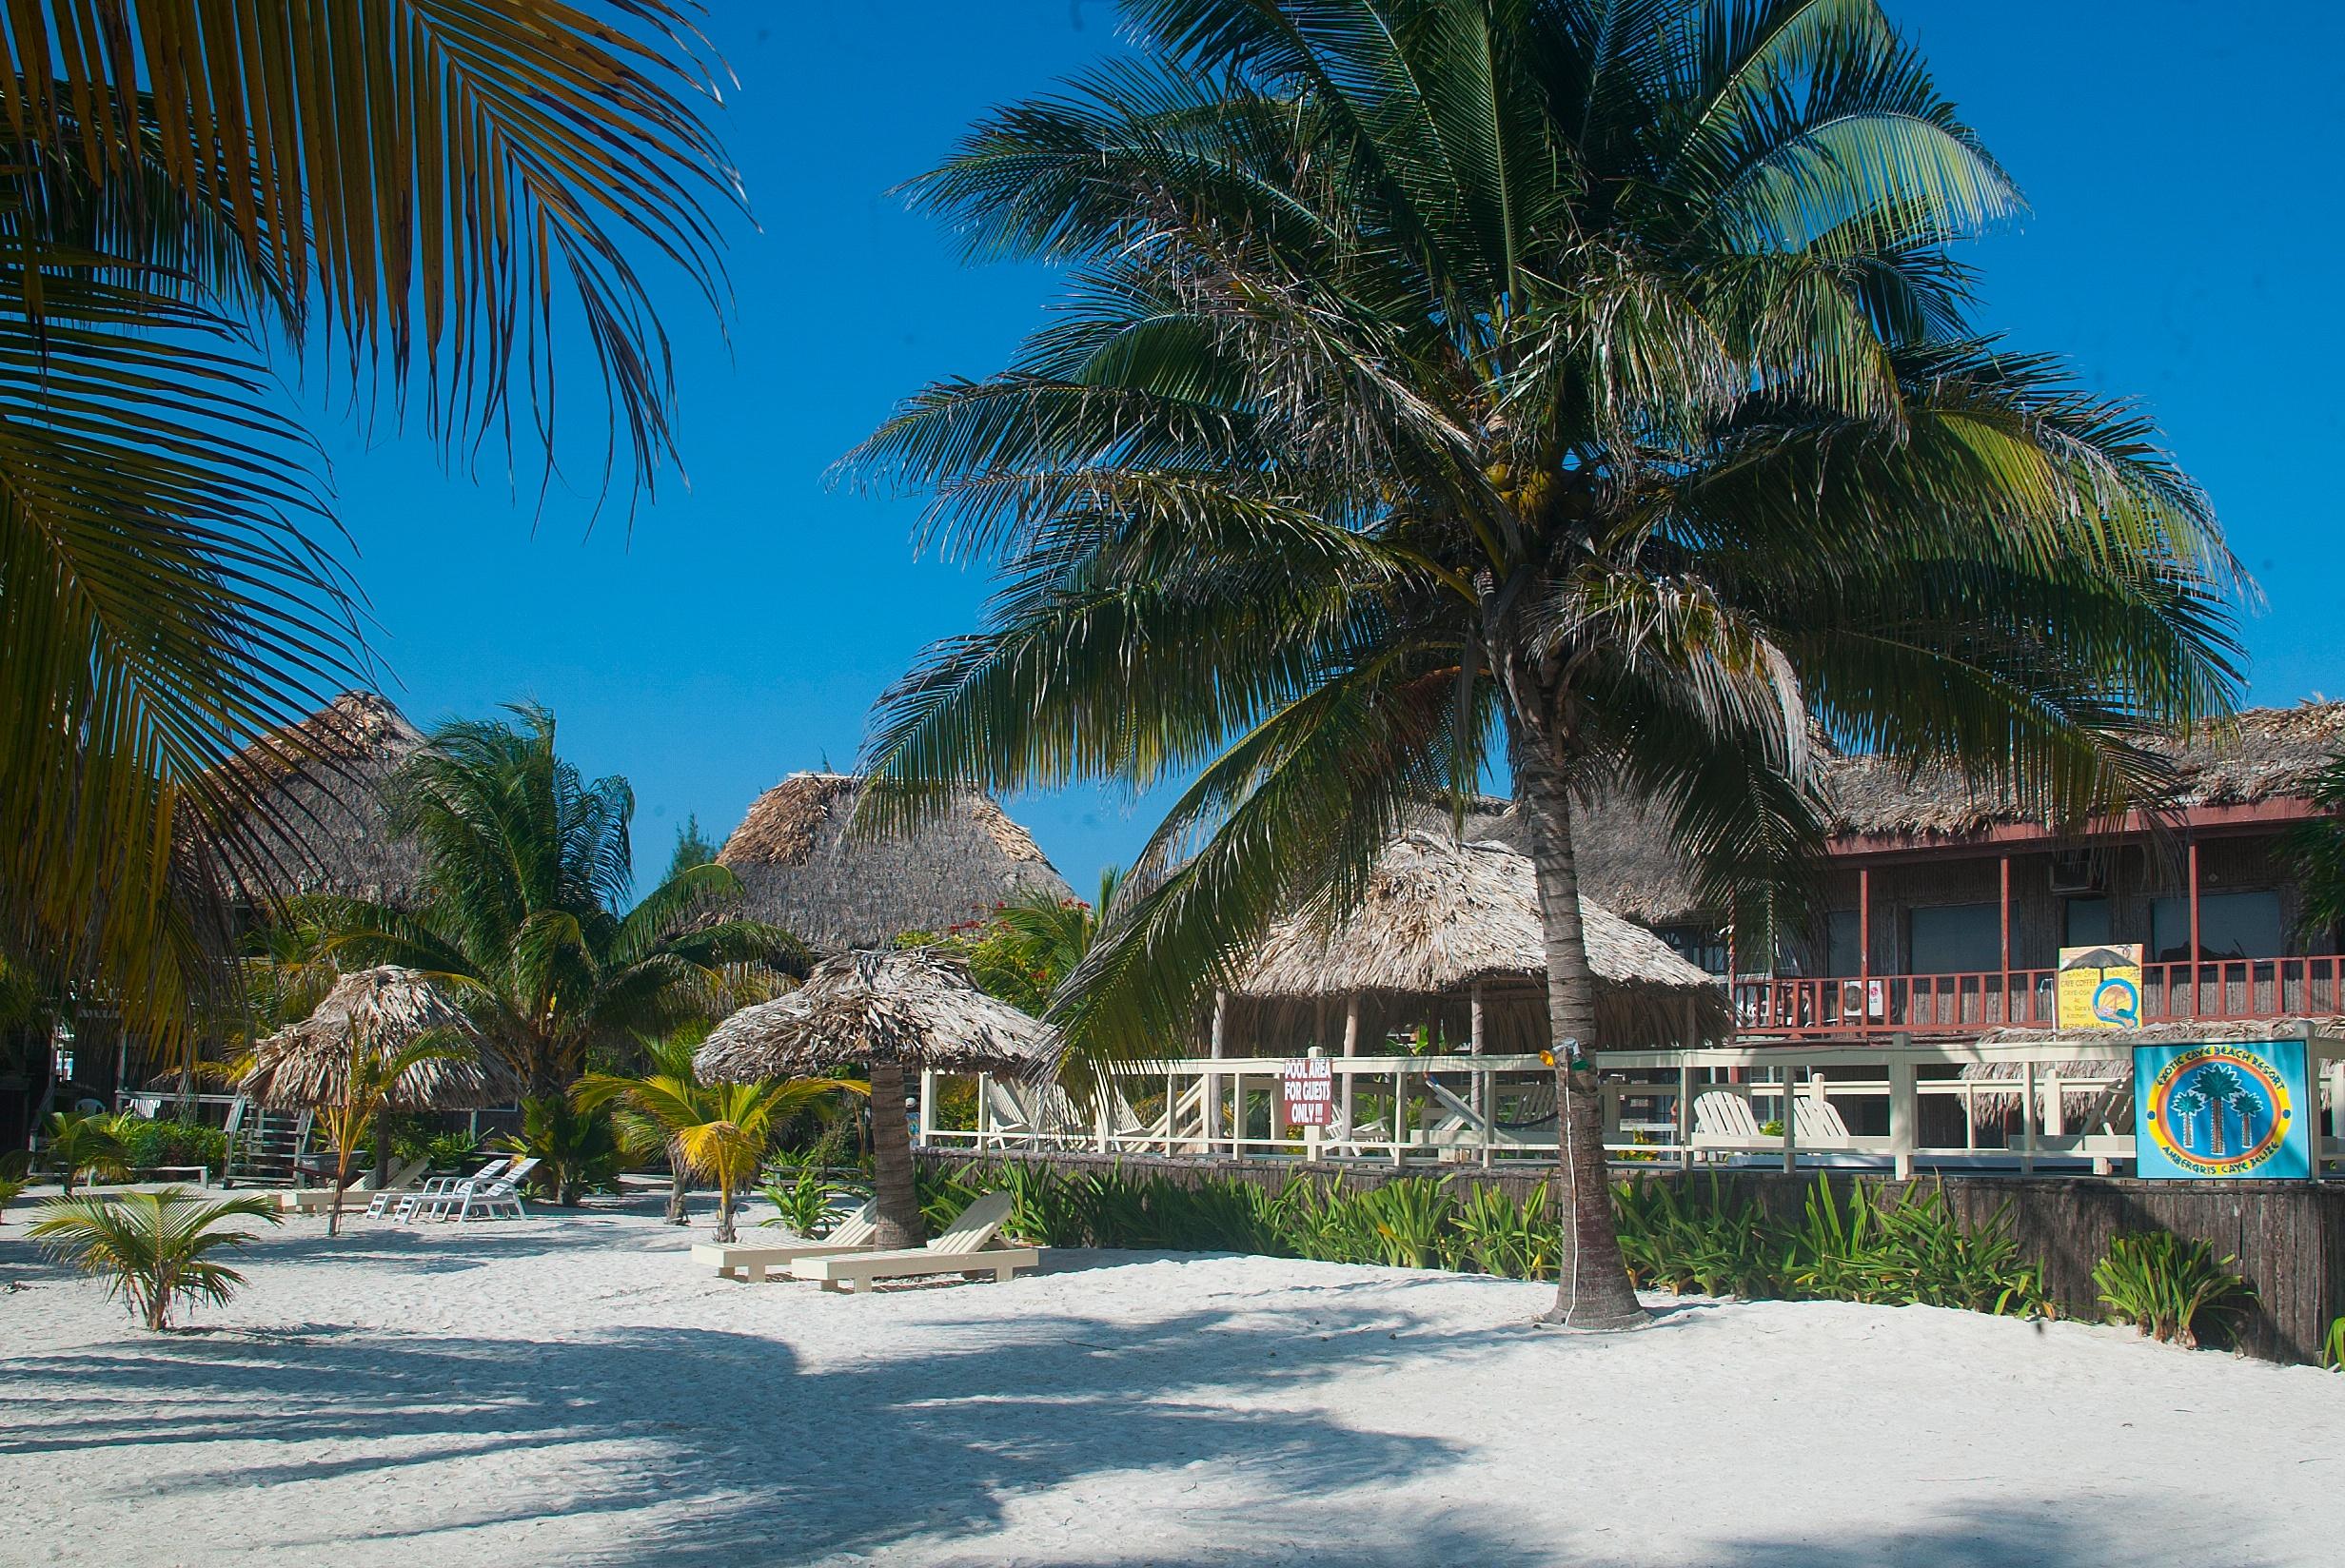 Grand Baymen, Ambergris Caye